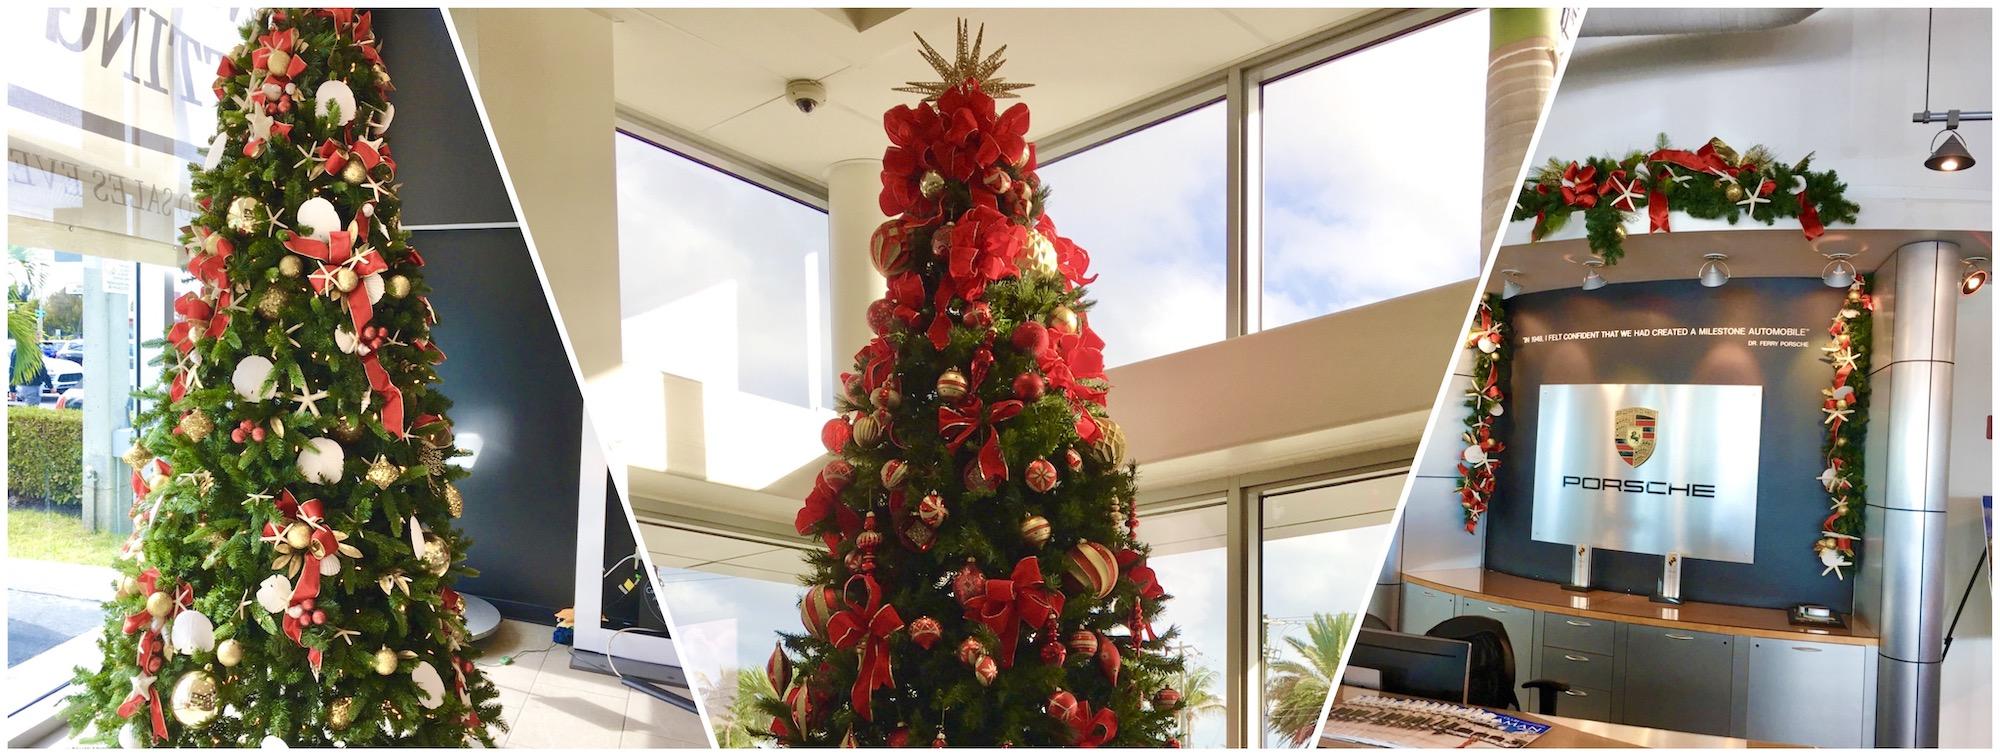 Car Dealership Decor Services - West Palm Beach , FL Velene's Floral